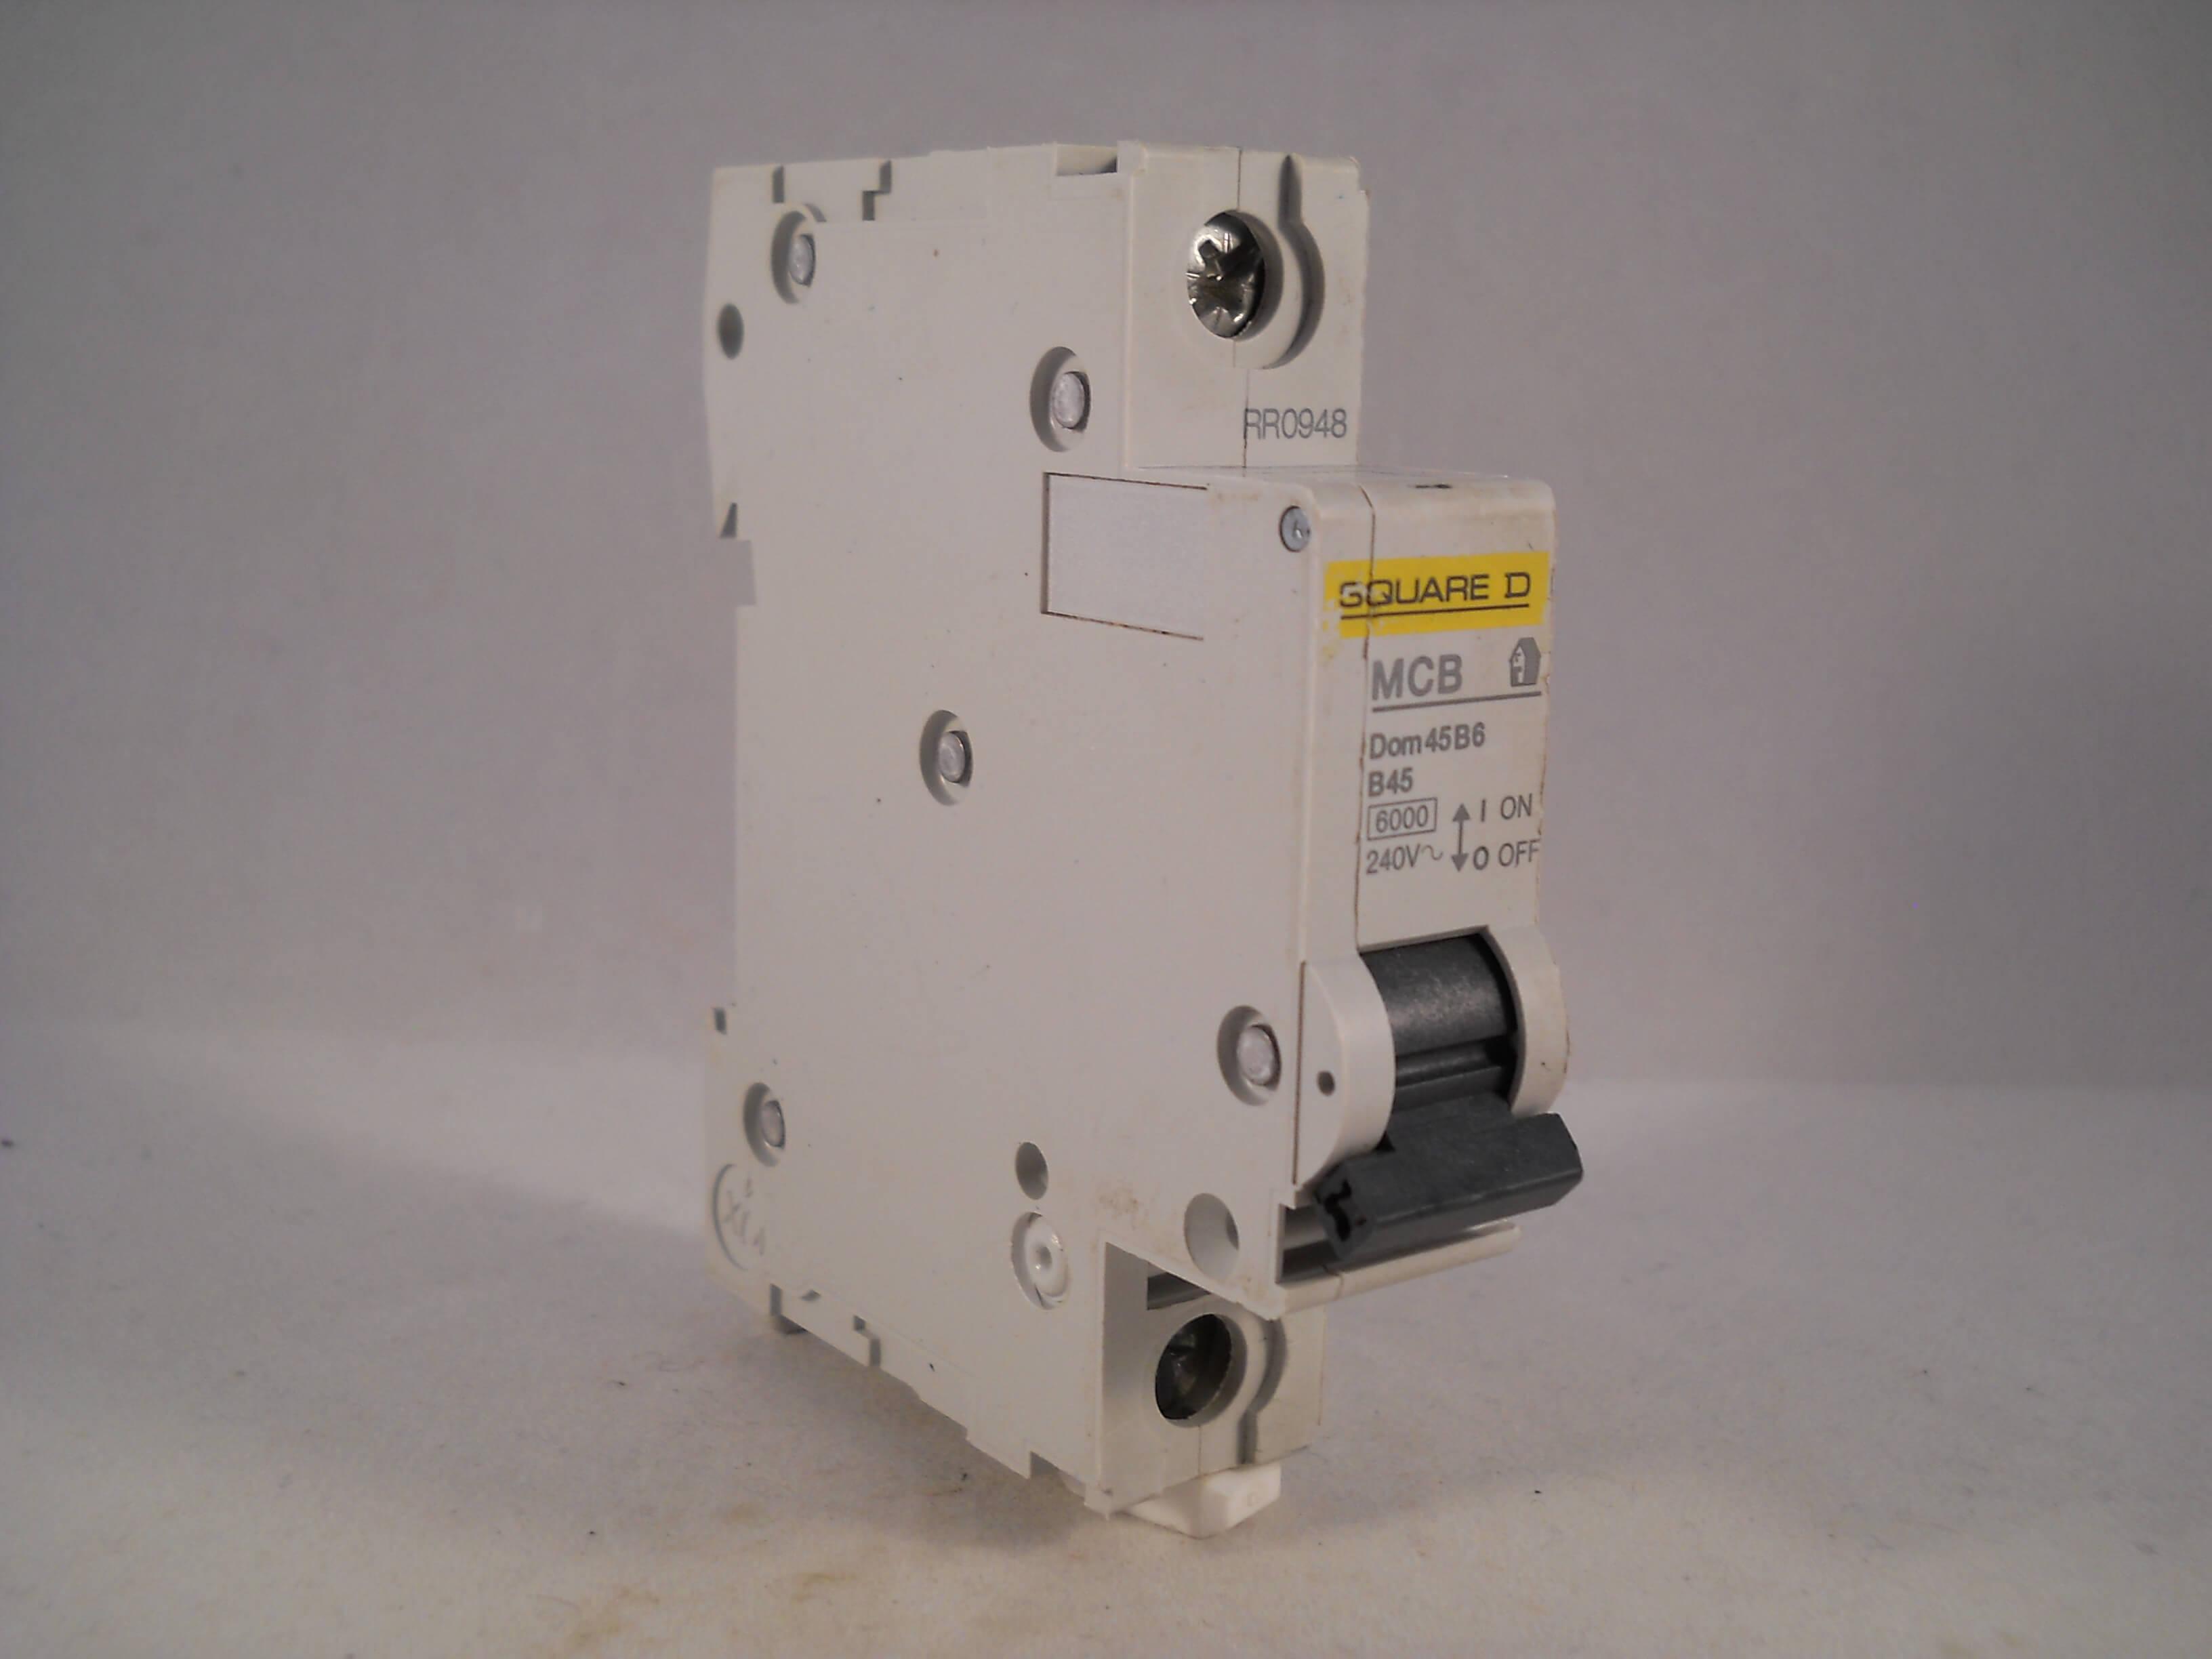 square d mcb 45 amp single pole circuit breaker b45 type b 45a domae rh willrose electrical co uk Universal Painless Wiring Fuse Block Marine Fuse Box